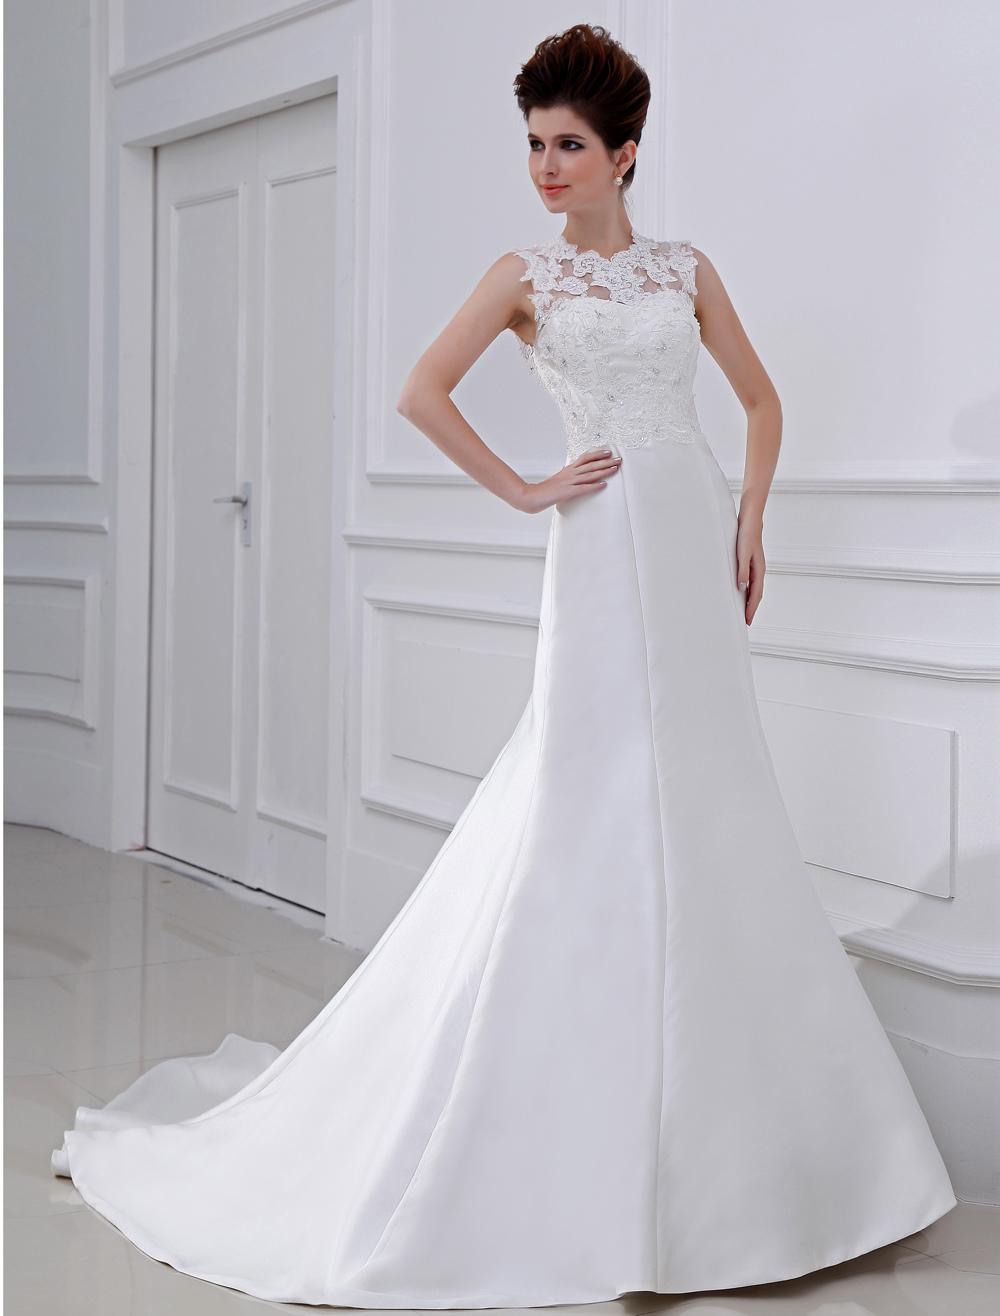 Glamorous Mermaid Sequin Taffeta White Bridal Wedding Gown